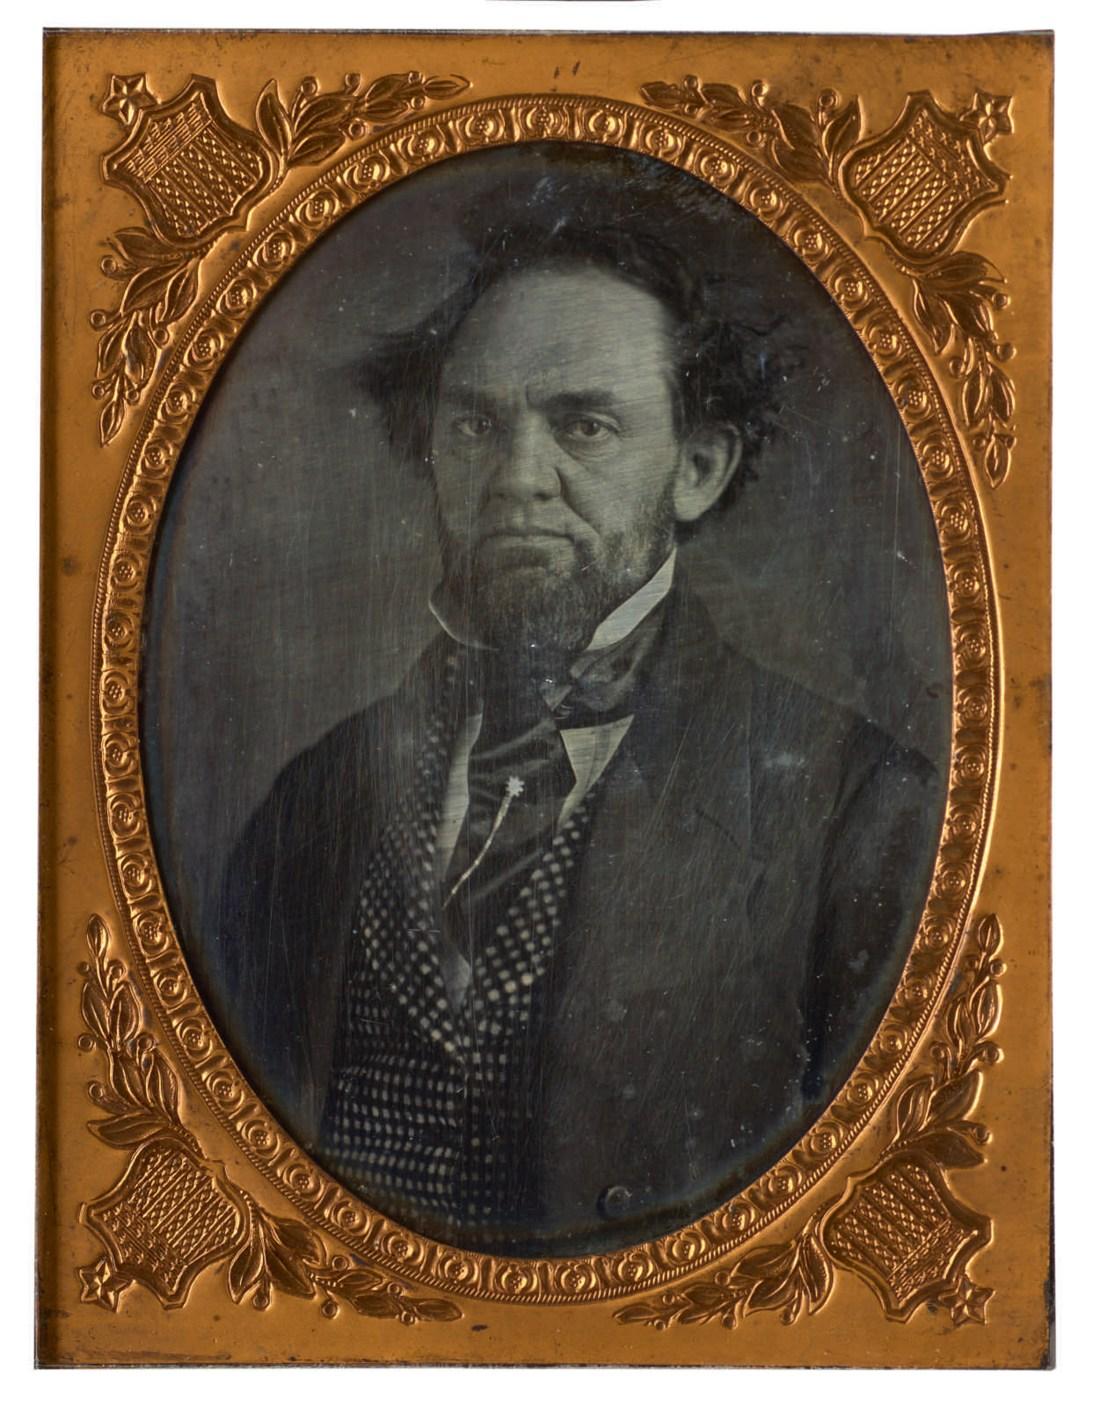 An 1851 daguerreotype of Phineas Taylor (P.T.) Barnum in its original metal case, shot in Cincinnati, Ohio by Thomas Faris.